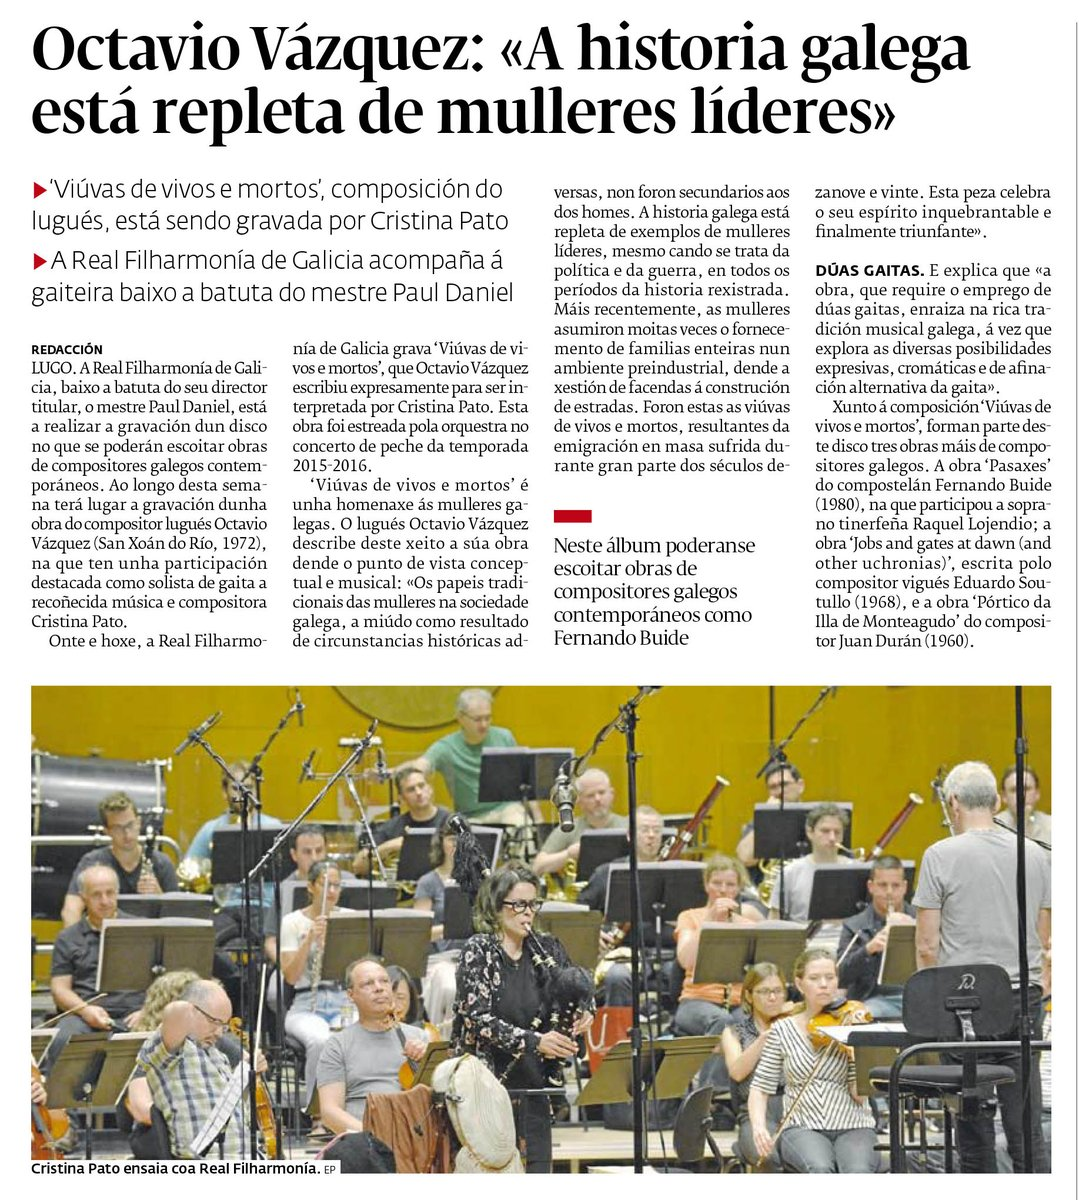 Cristina Pato - Real Filharmonía de Galicia